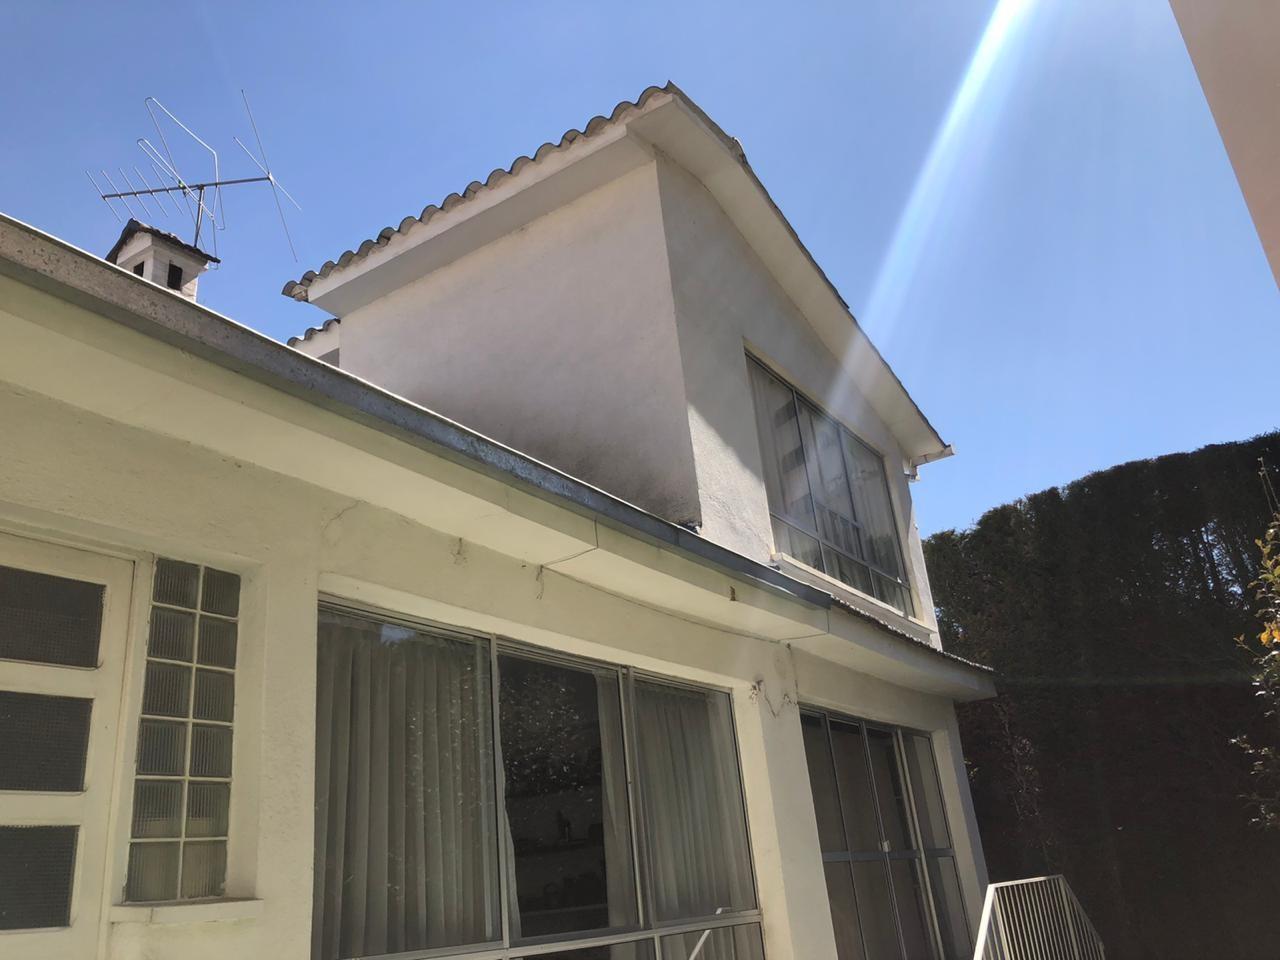 Casa en Alquiler Av. Sanches Lima esquna Kantutani, Detras Imcruz (Casa Para Oficina) Foto 14